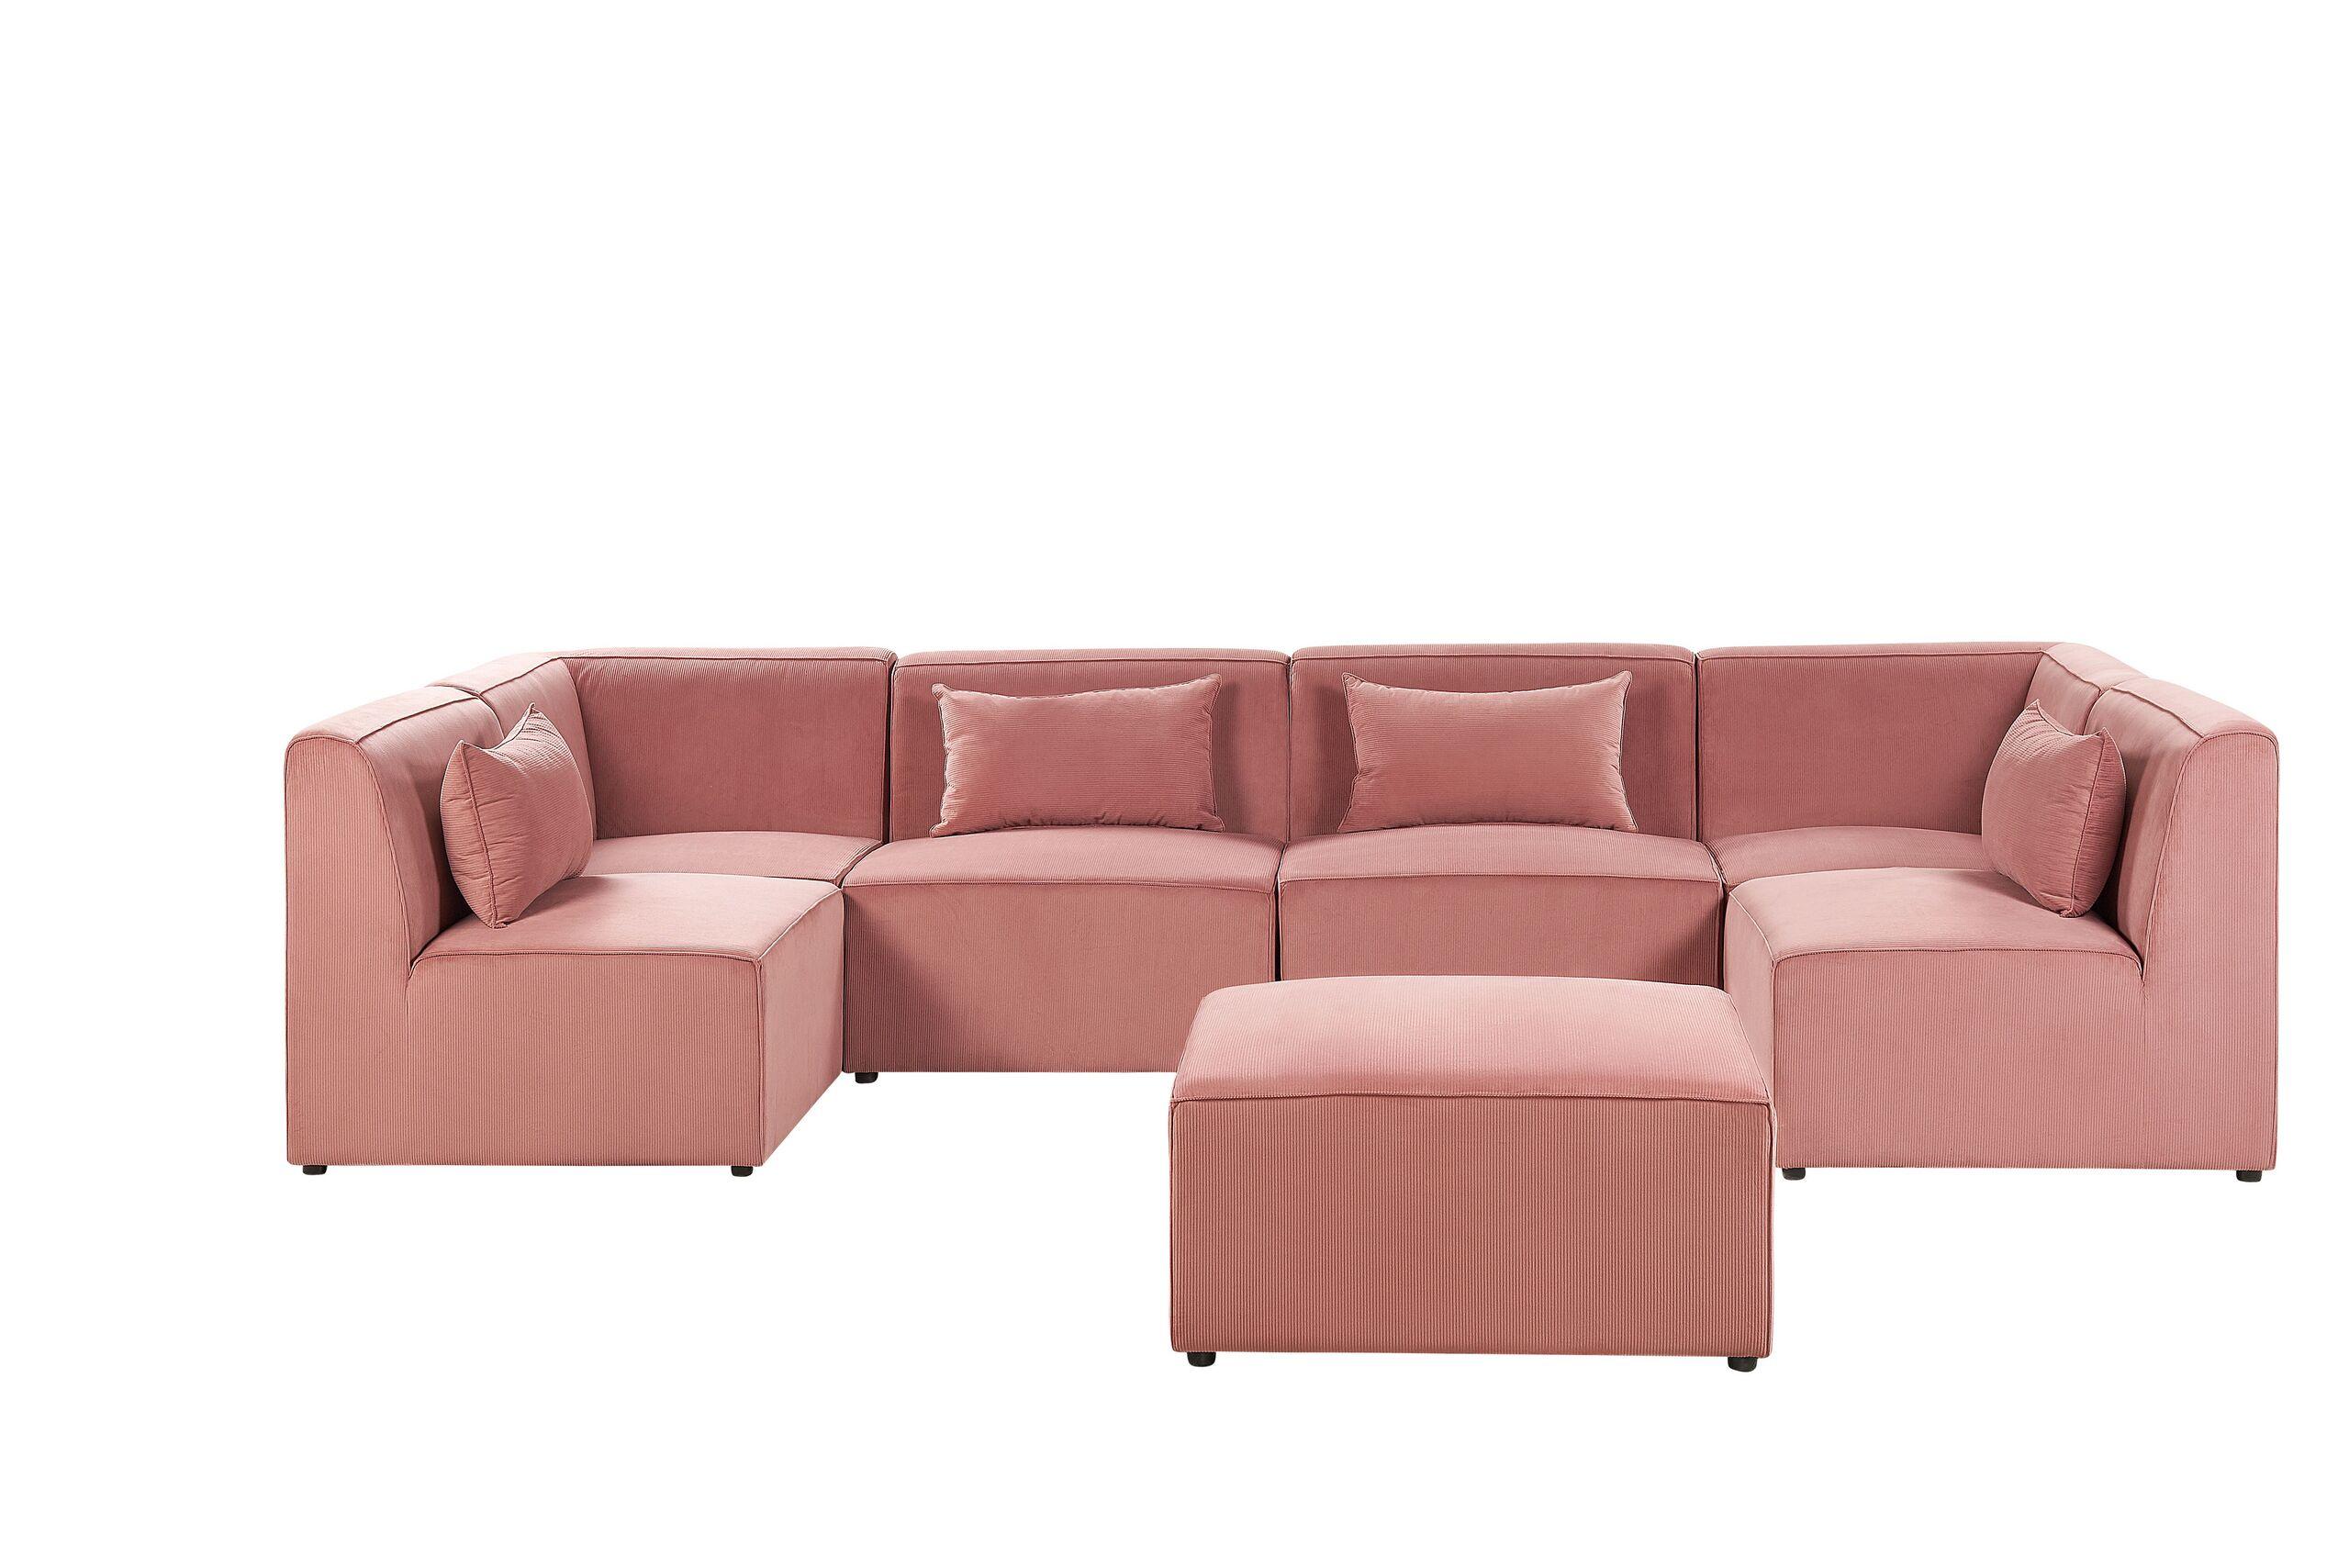 Canapé d'angle 6 places Rose Velours Moderne Grand